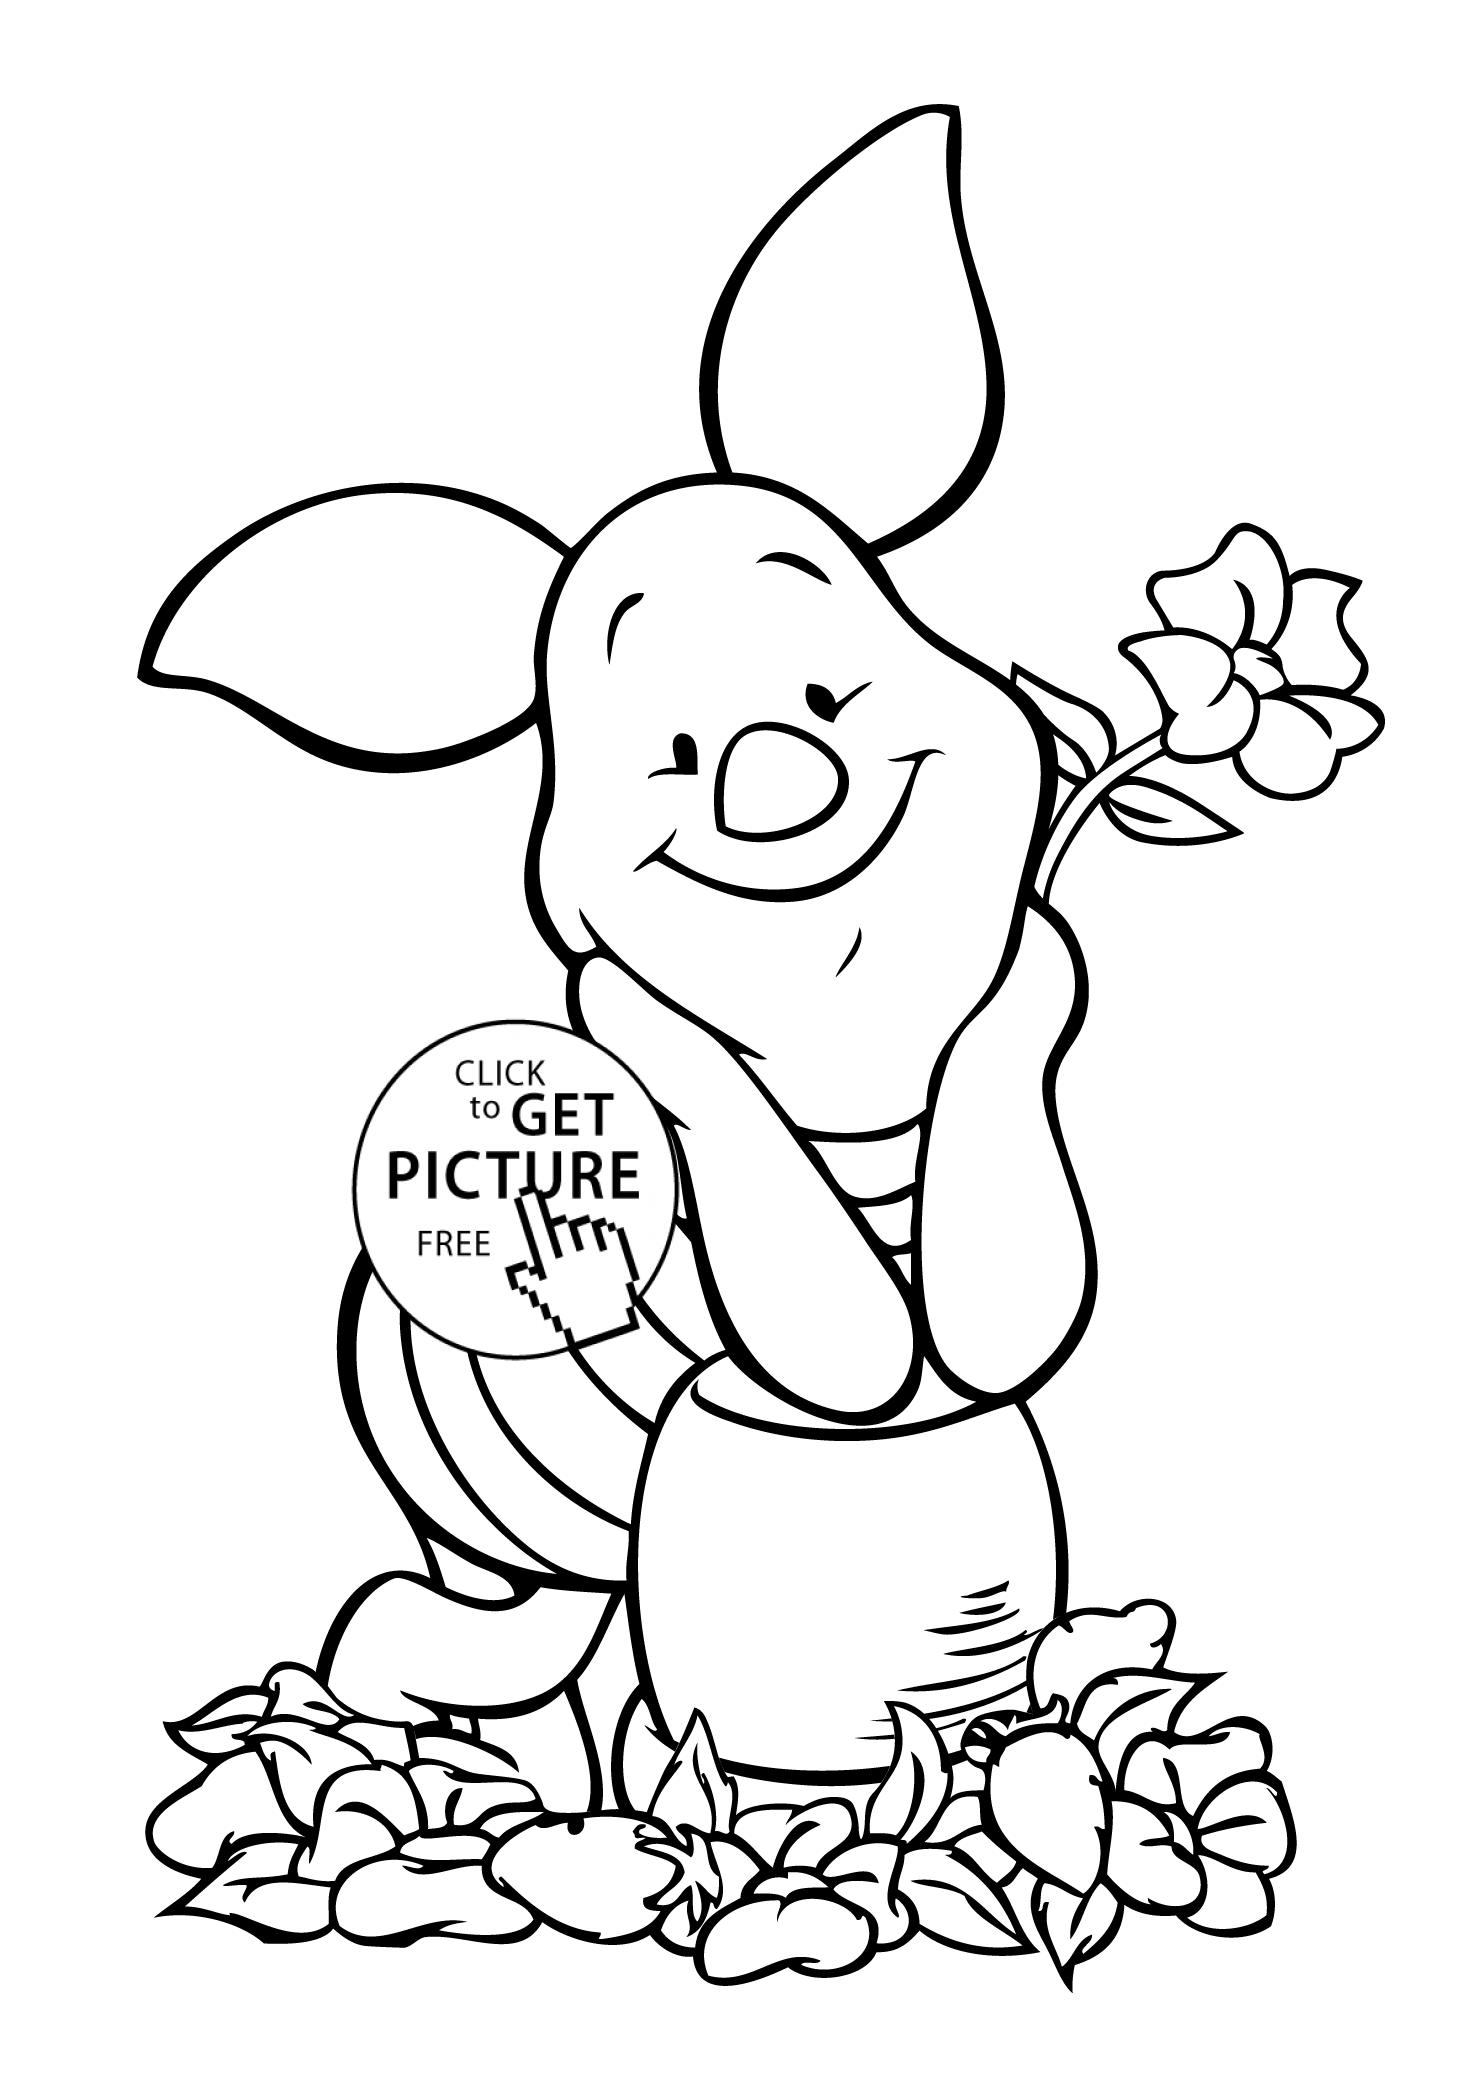 Winnie Pooh Piglet Coloring Page For Kids Free Printable